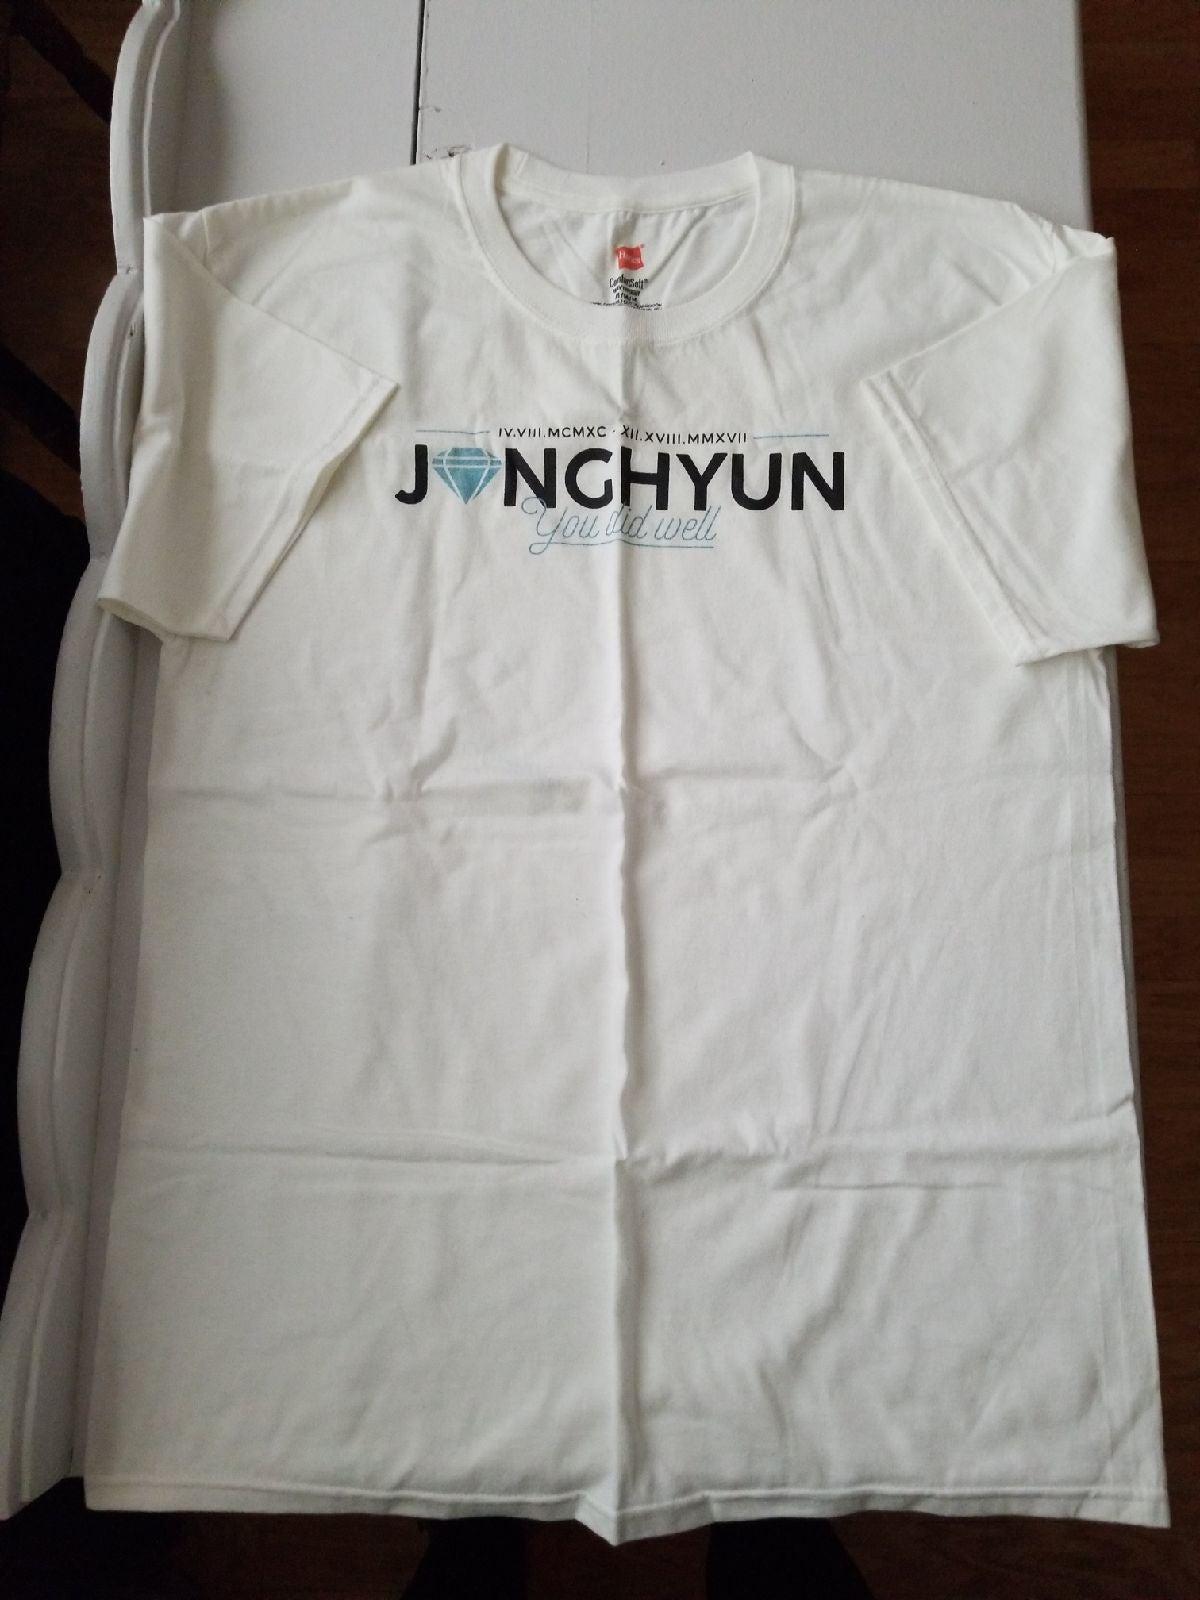 Jonghyun Shirt